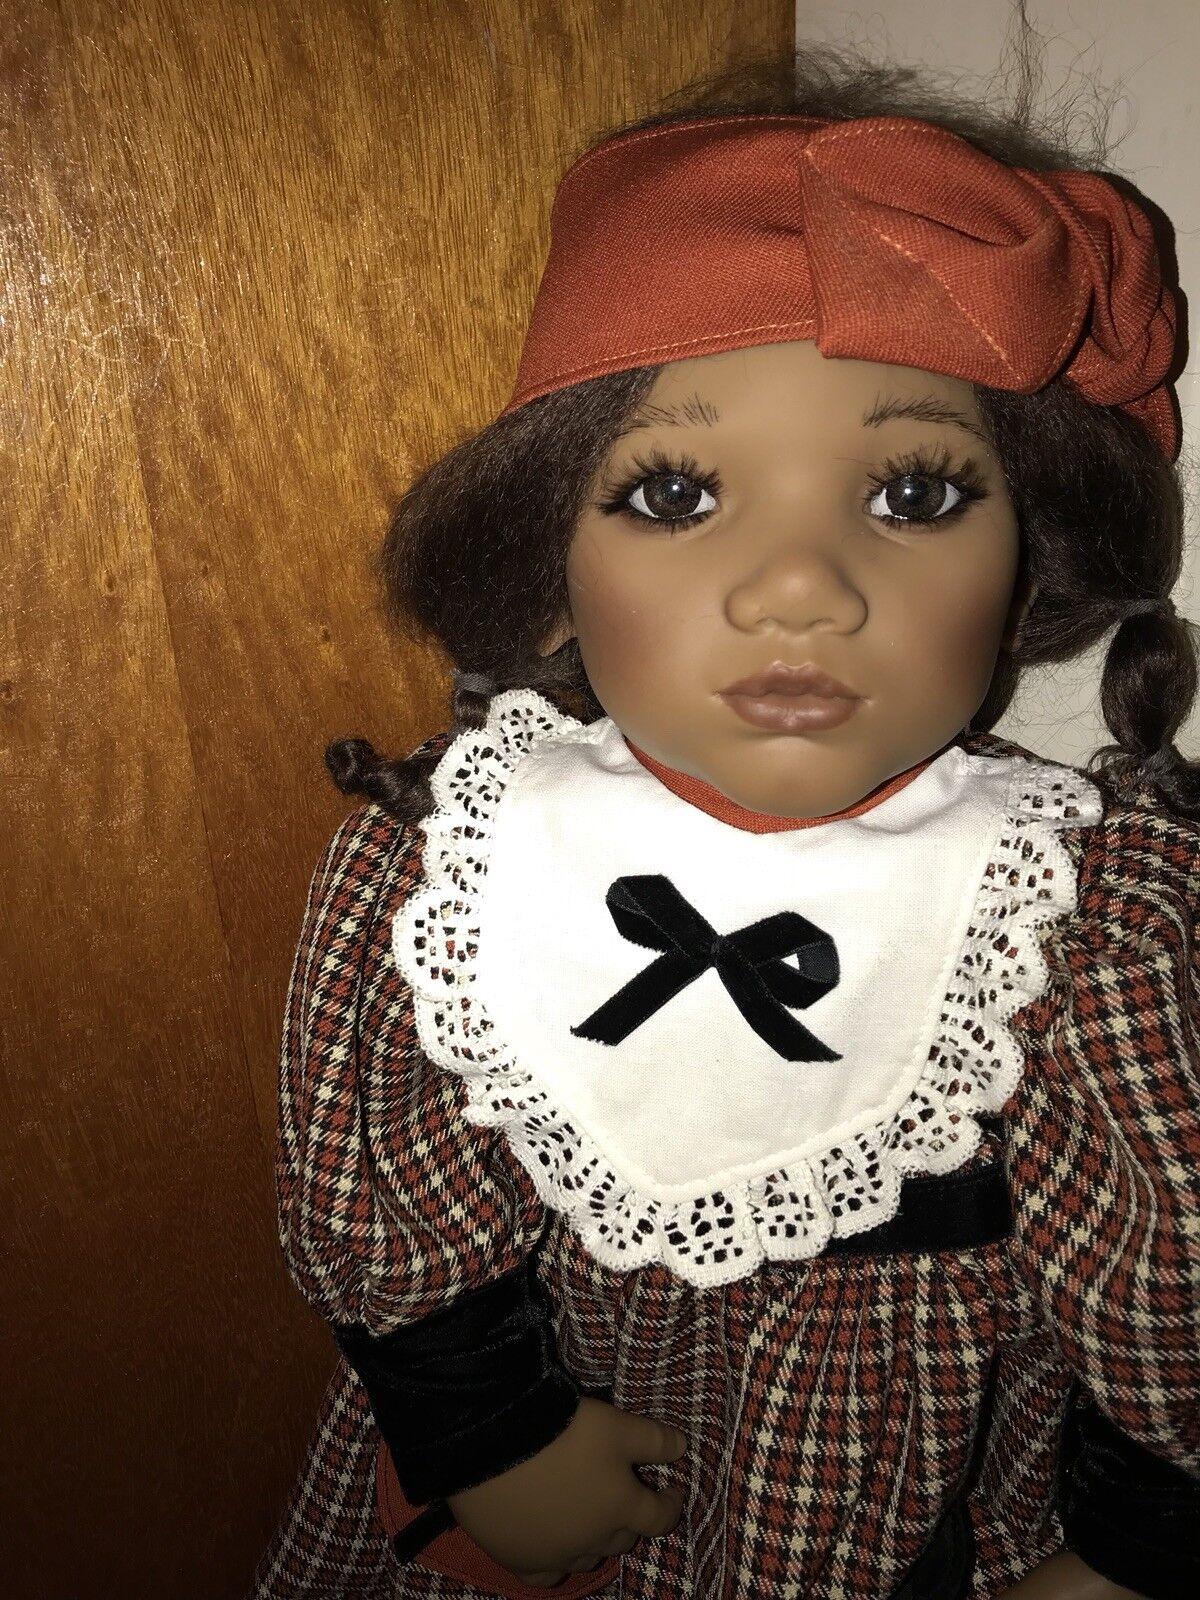 Annette Himstedt  Takumi 10 Jahres Kind aus Vynil mit Extra Kleidung Top-Zustand